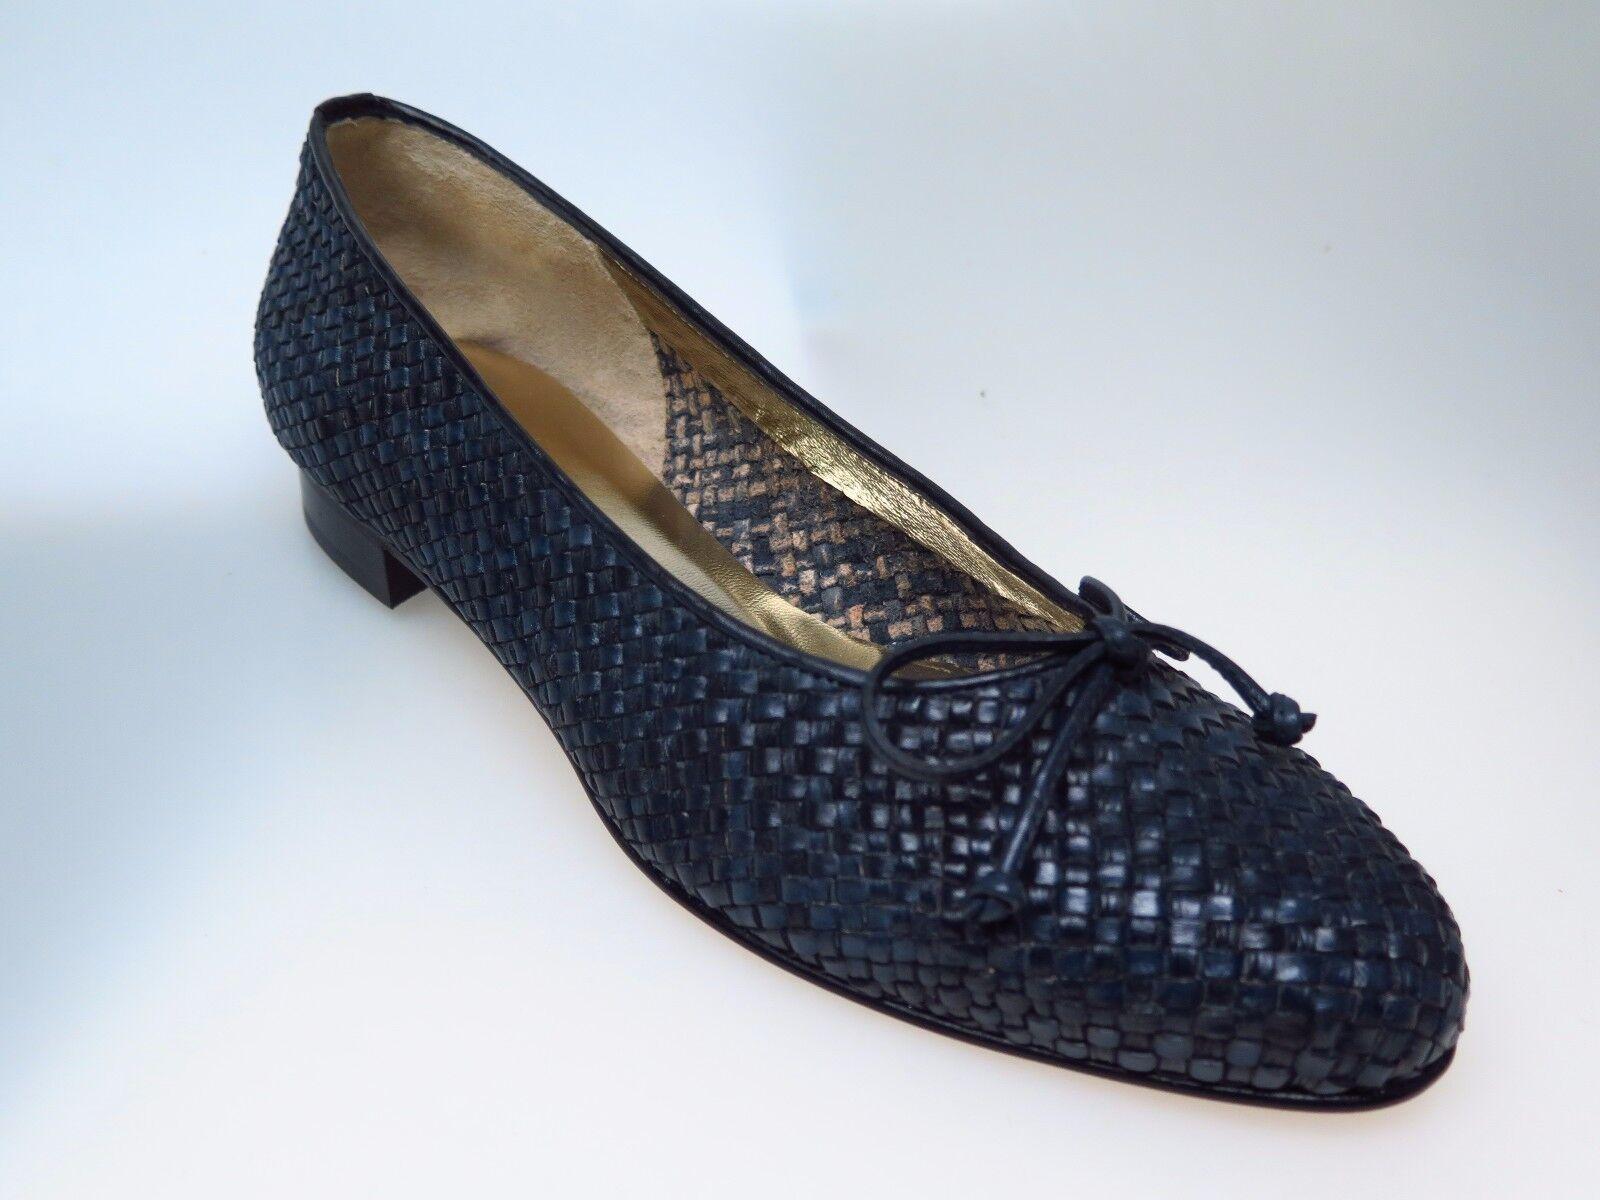 MARETTO  Designer Damenschuhe 6231 Ameta Blau Bleu Leder Gr Schuhe Gr Leder 41,5 NEU ef80ab